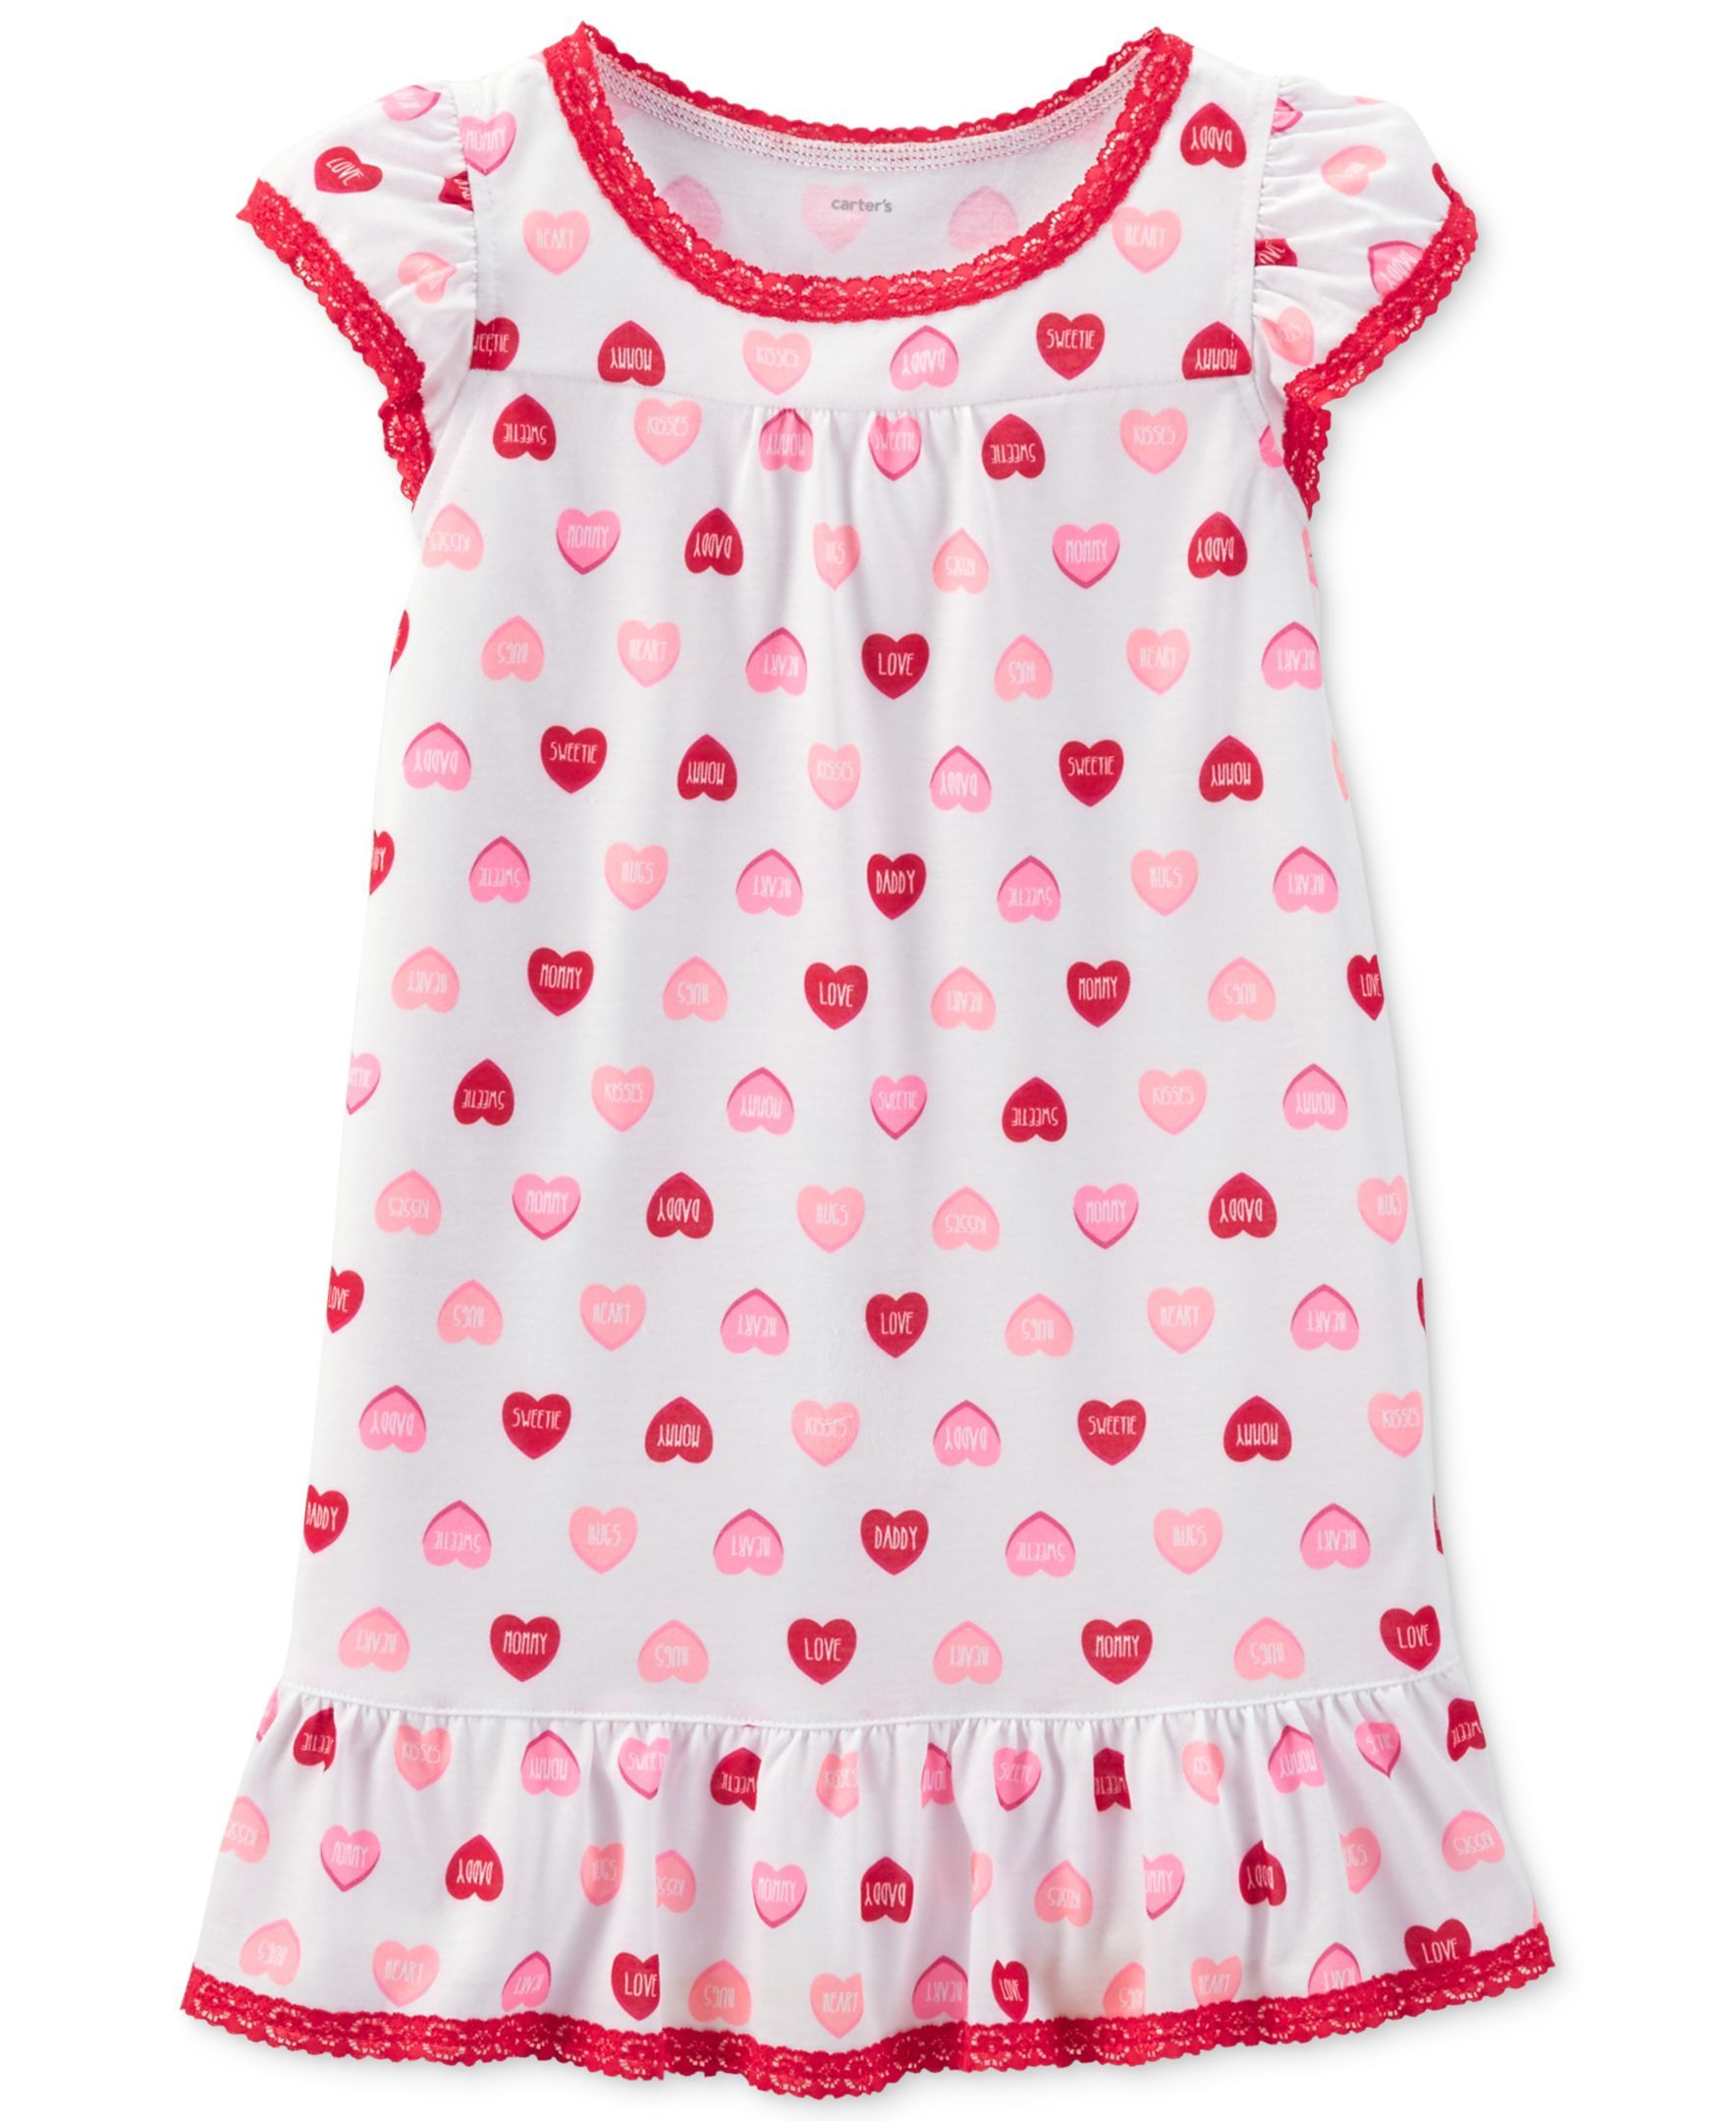 9725f4214 Carter s Little Girls  or Toddler Girls  Nightgown